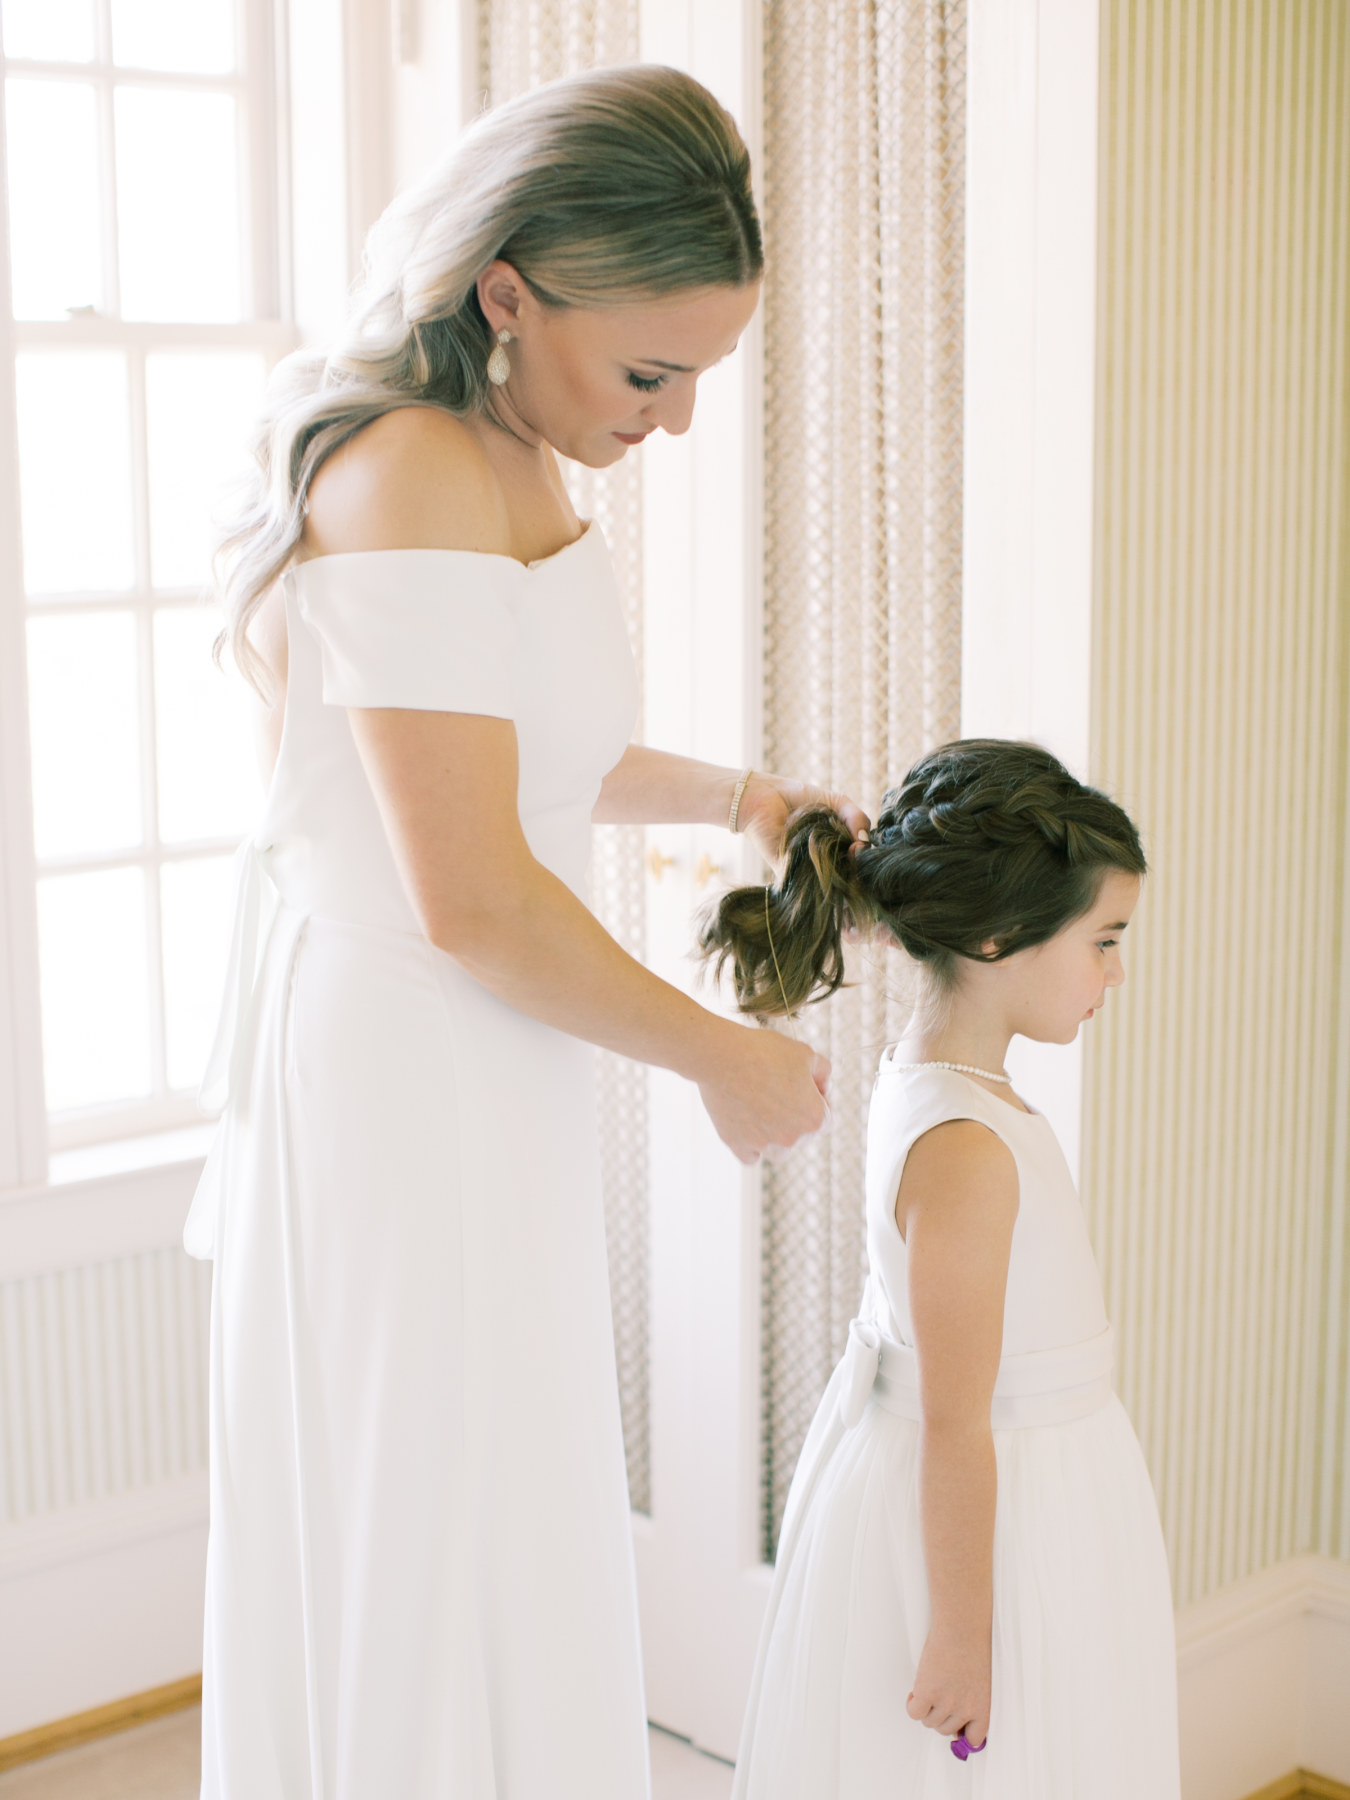 16Great_Marsh_Estates_Wedding_Anne_Kelley_Events_Astrid_PhotographyAP_01723